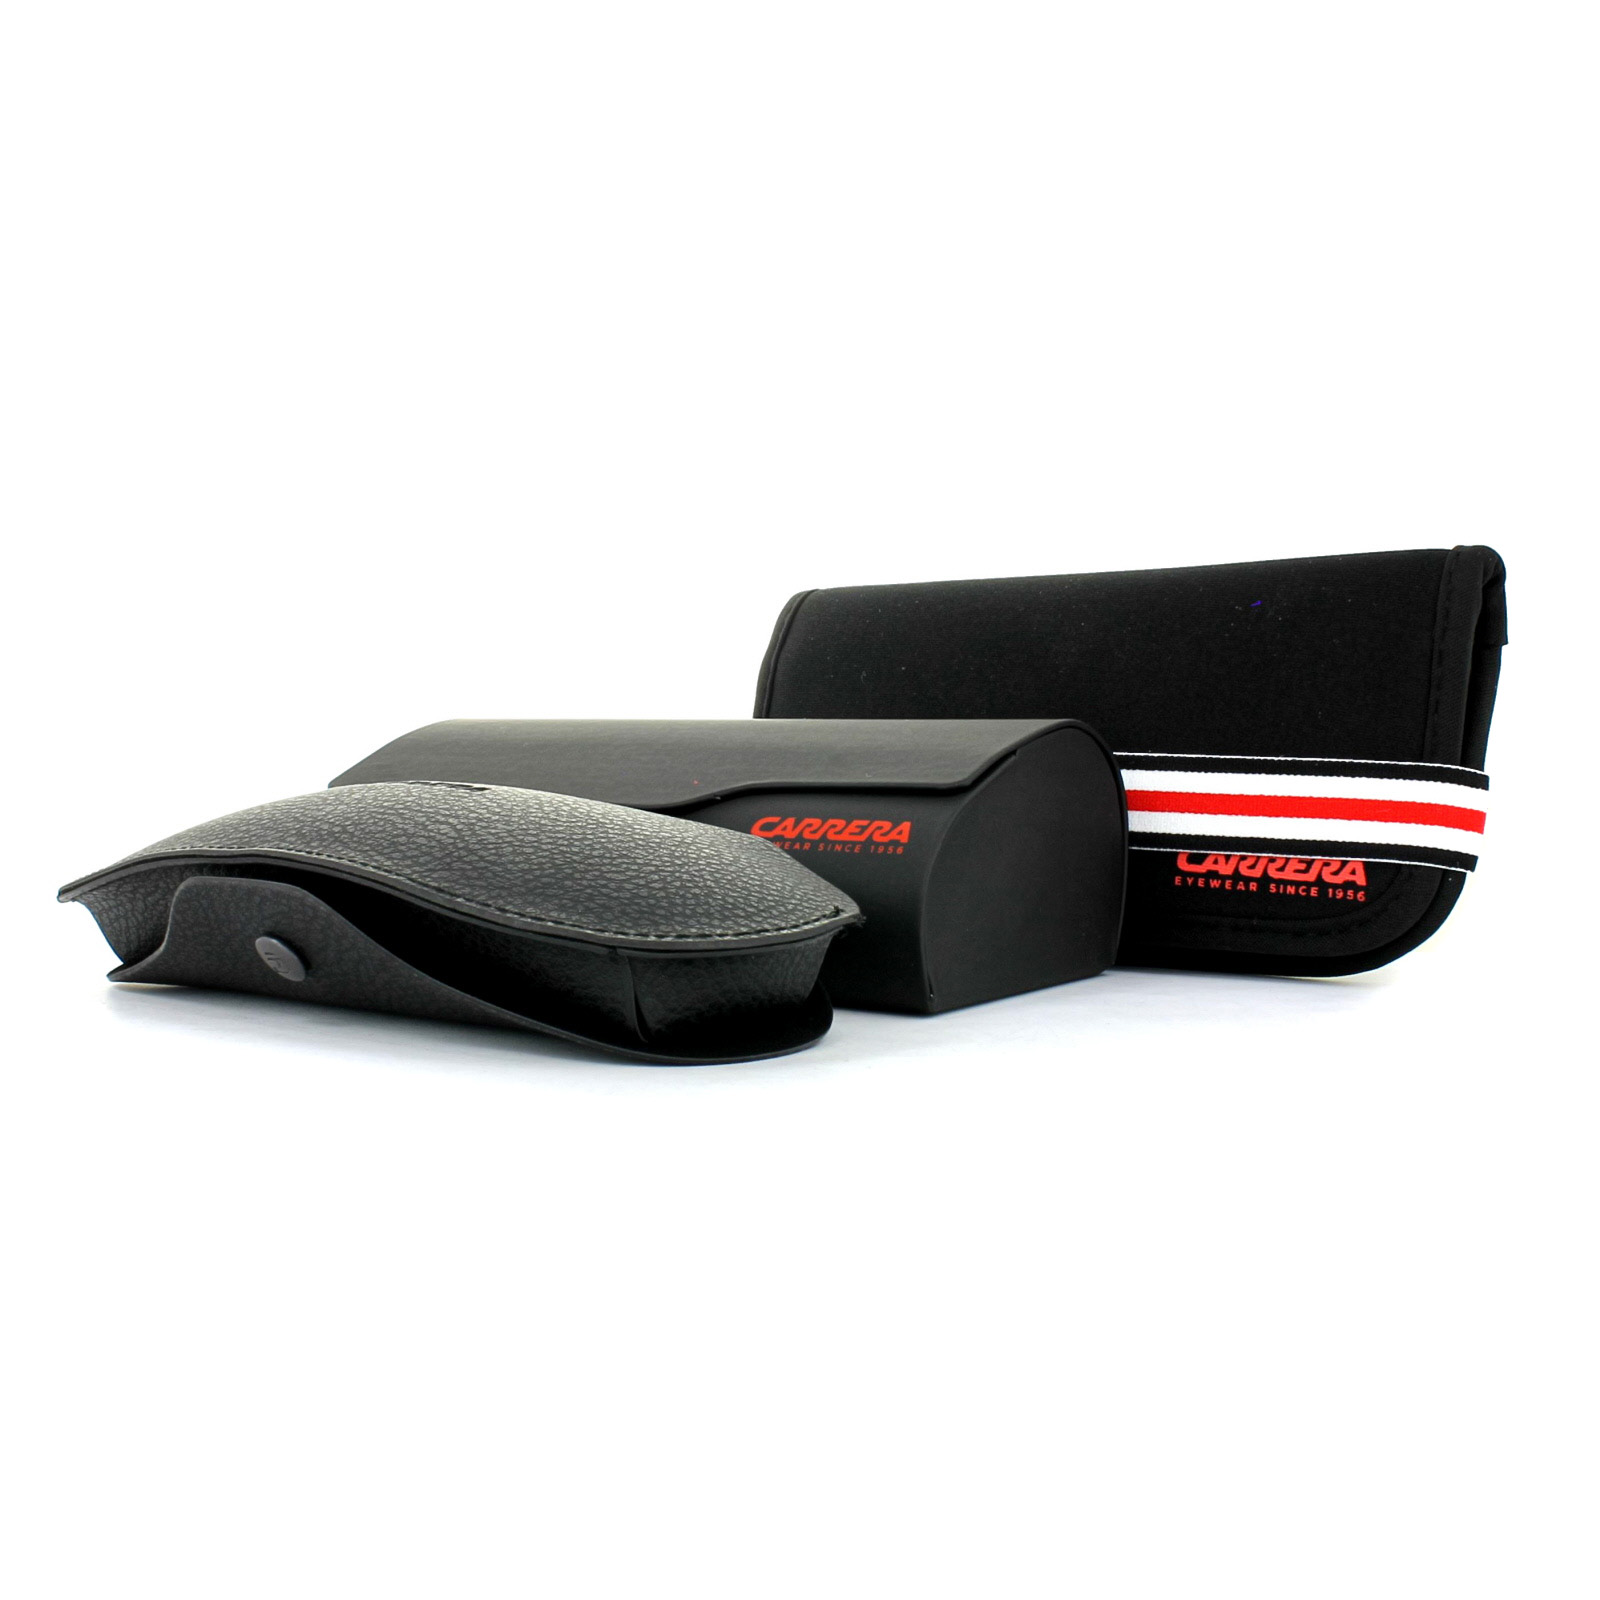 11f86f8096eec Sentinel Carrera Sunglasses 1007 S C9A 9O Red Gold Dark Grey Gradient